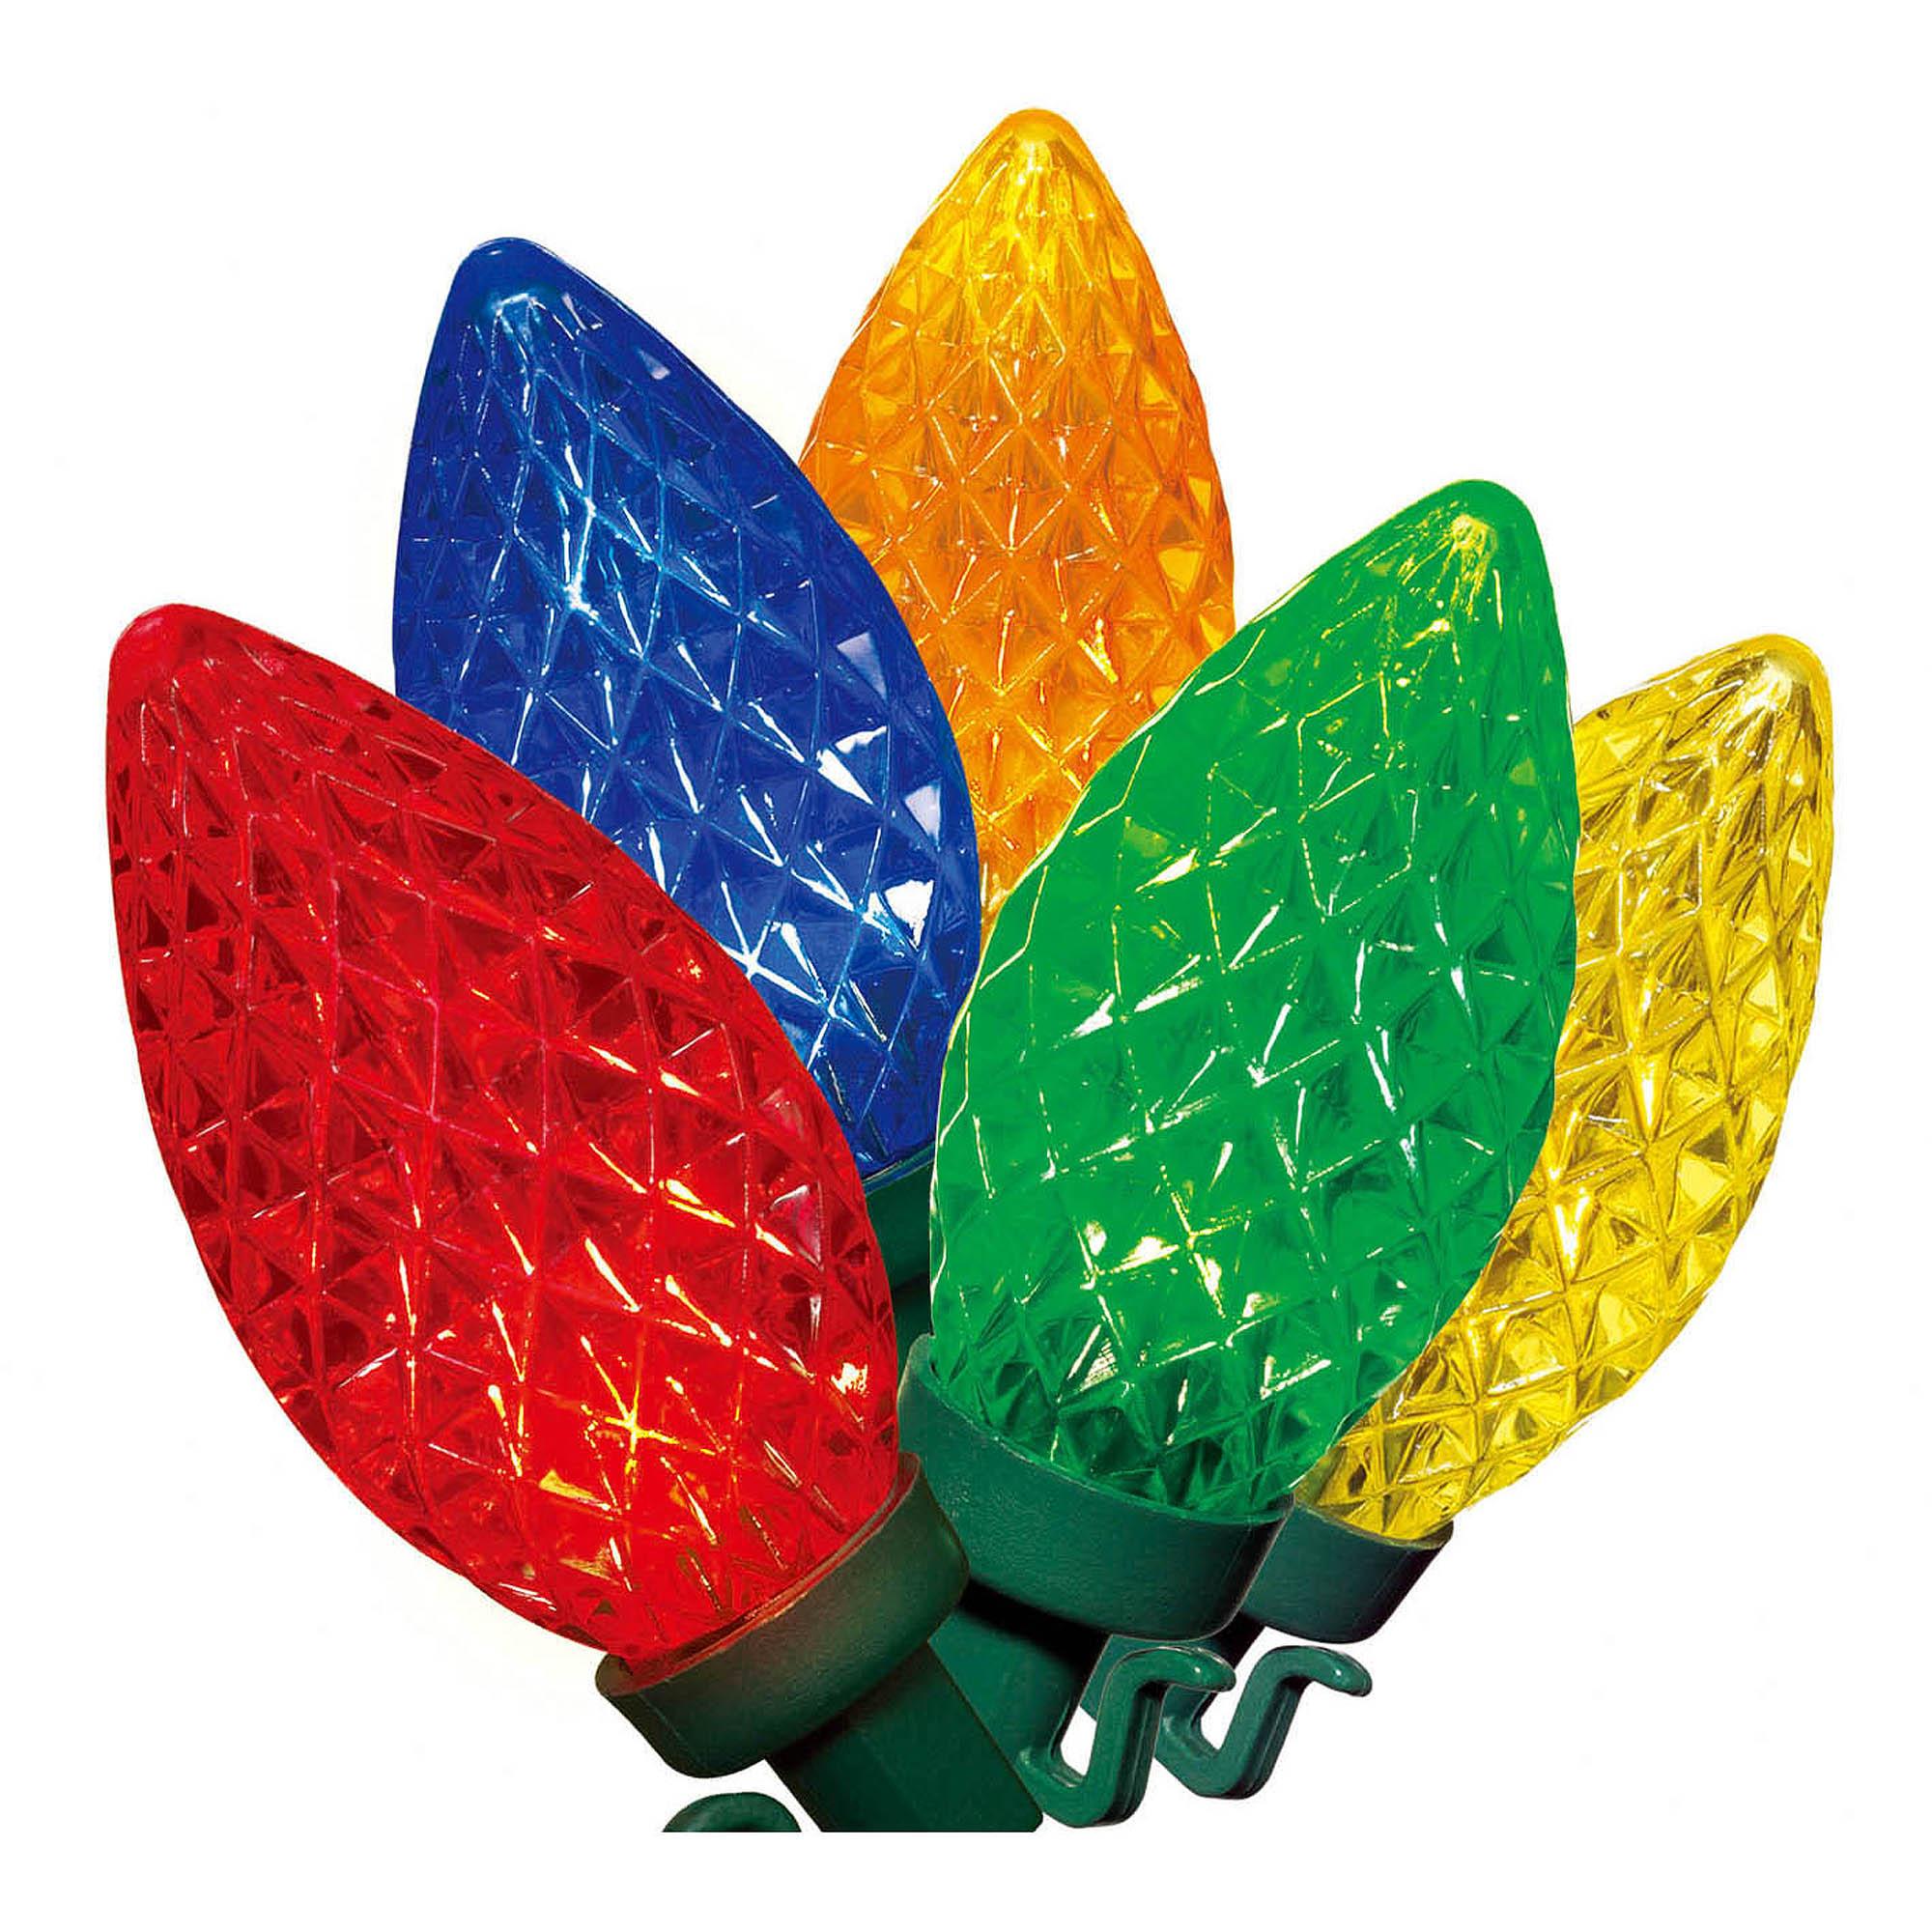 Walmart Holiday Time Brand Seasonal Lights Recalled Muskoka411 Com